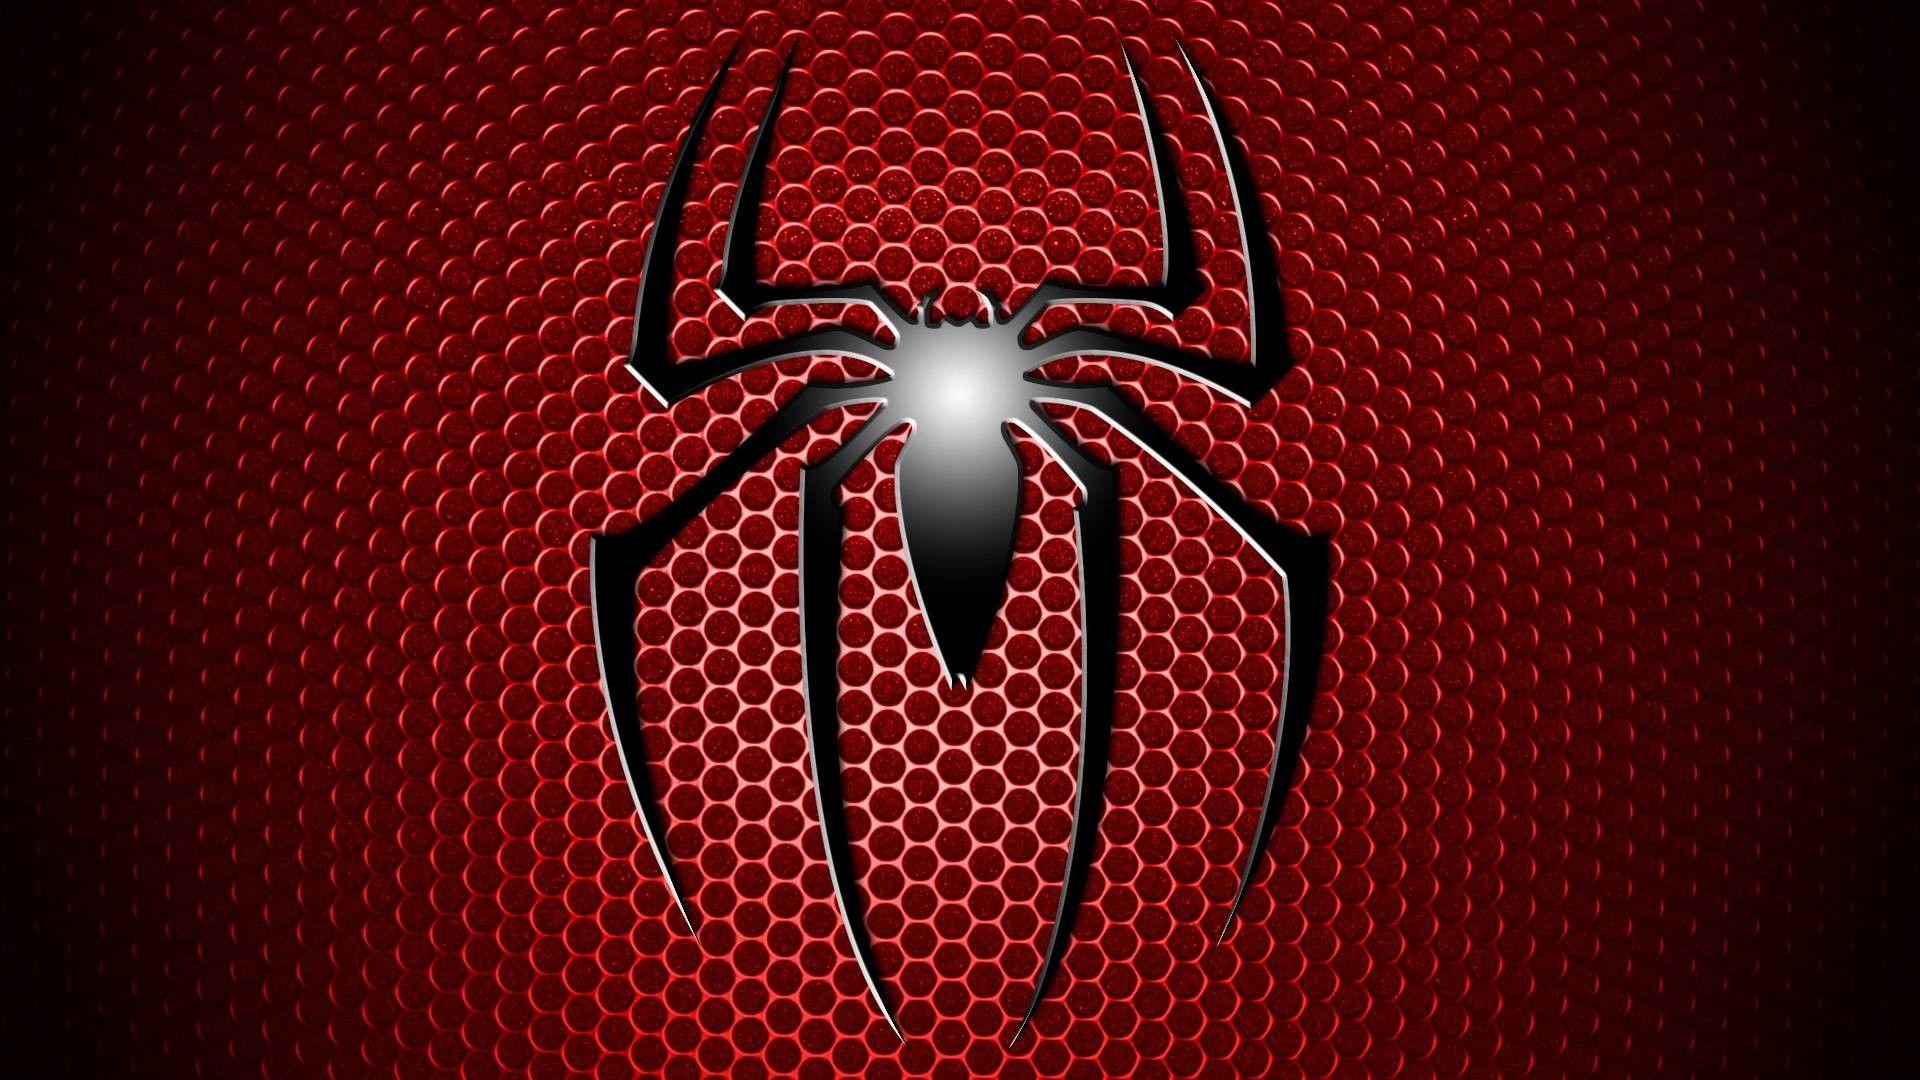 Fondos De 1920x1080 Para Spiderman Logo Wallpaper Spider Man Wallpaper Spiderman Images Man Wallpaper